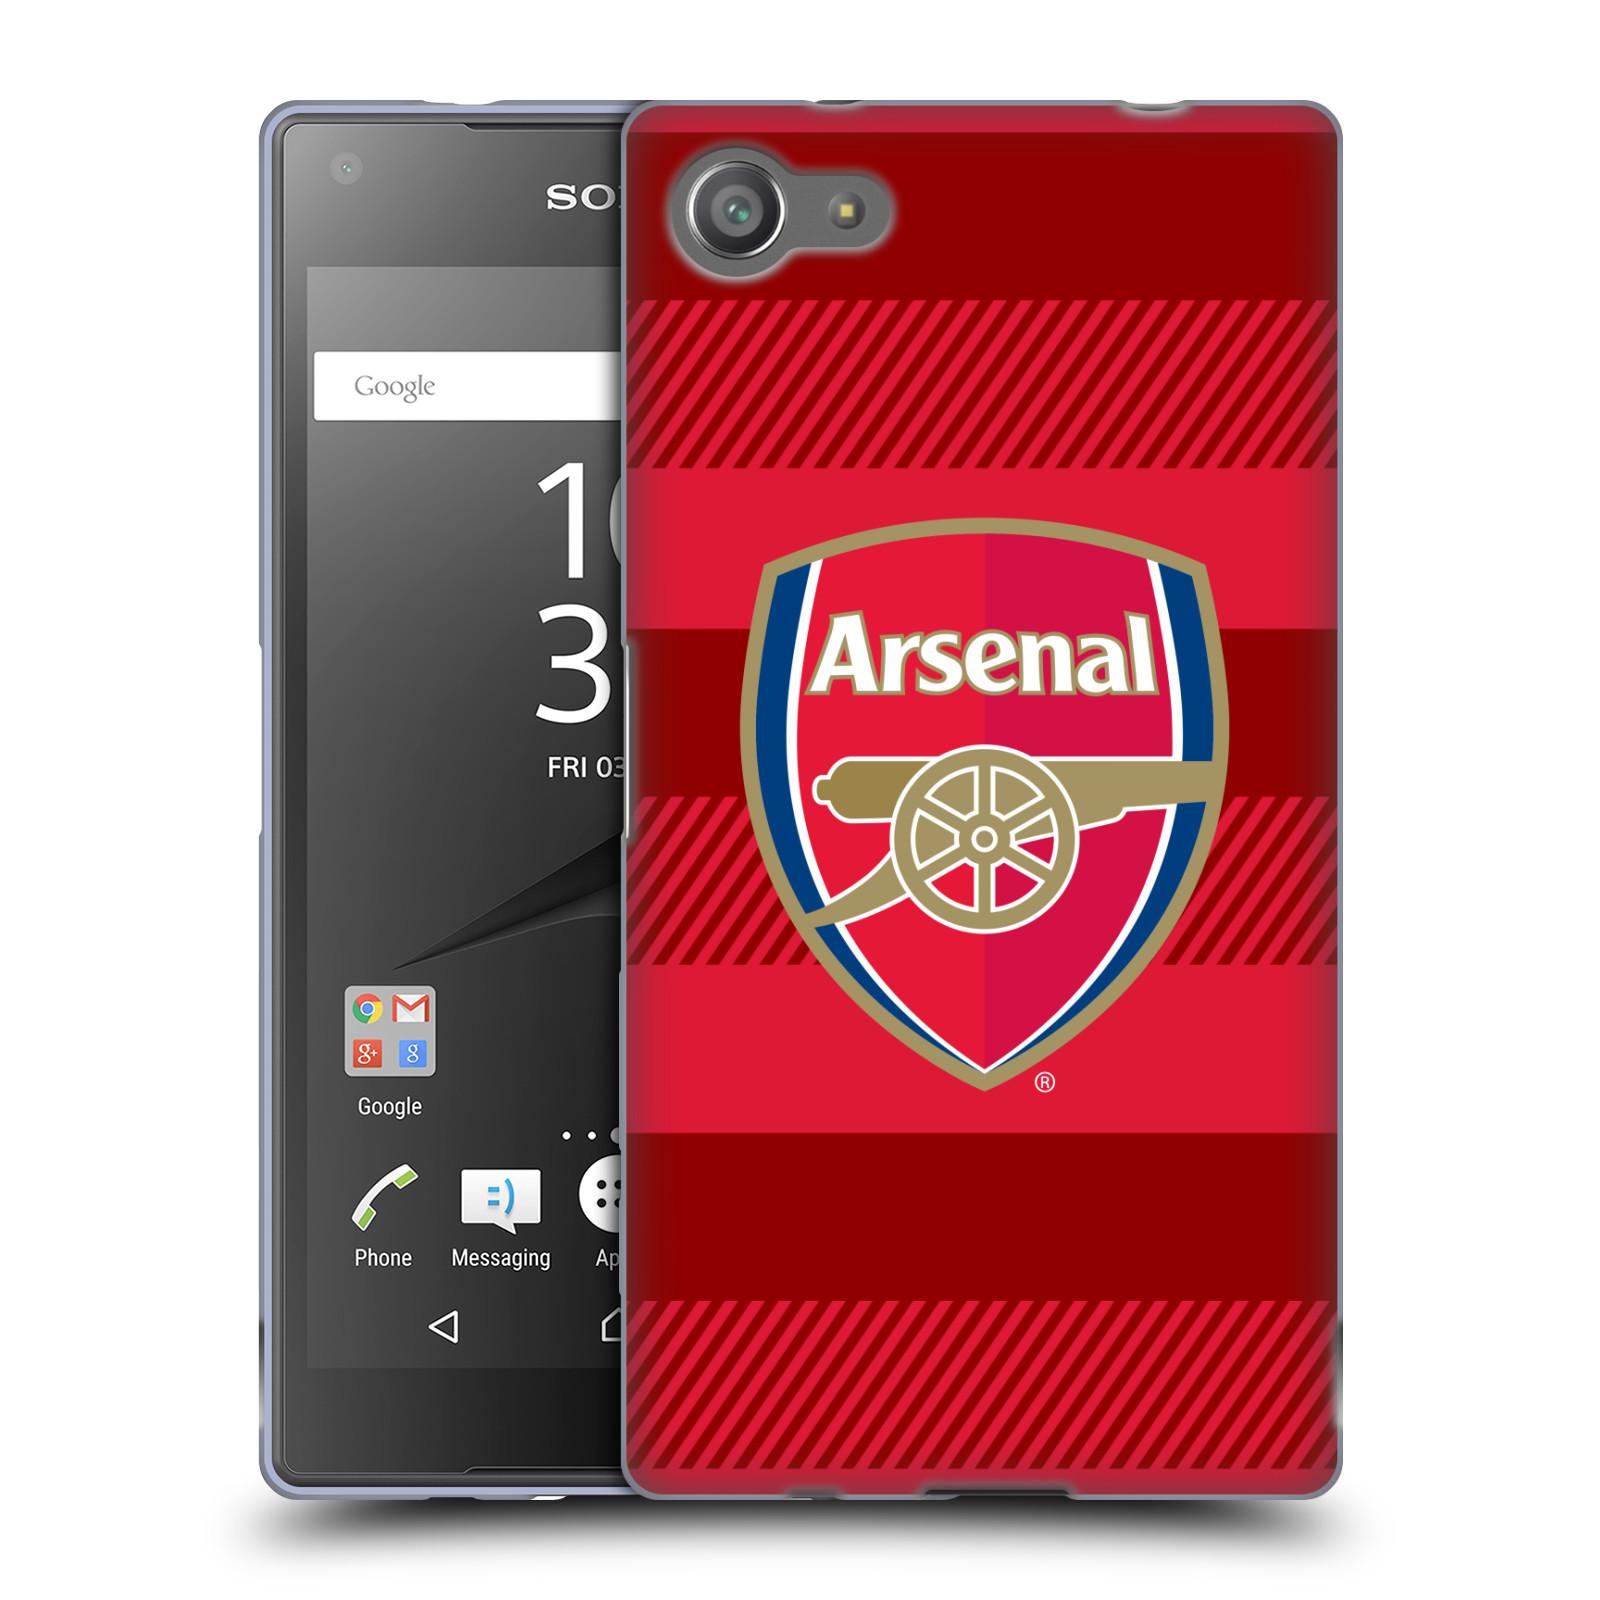 Silikonové pouzdro na mobil Sony Xperia Z5 Compact - Head Case - Arsenal FC - Logo s pruhy